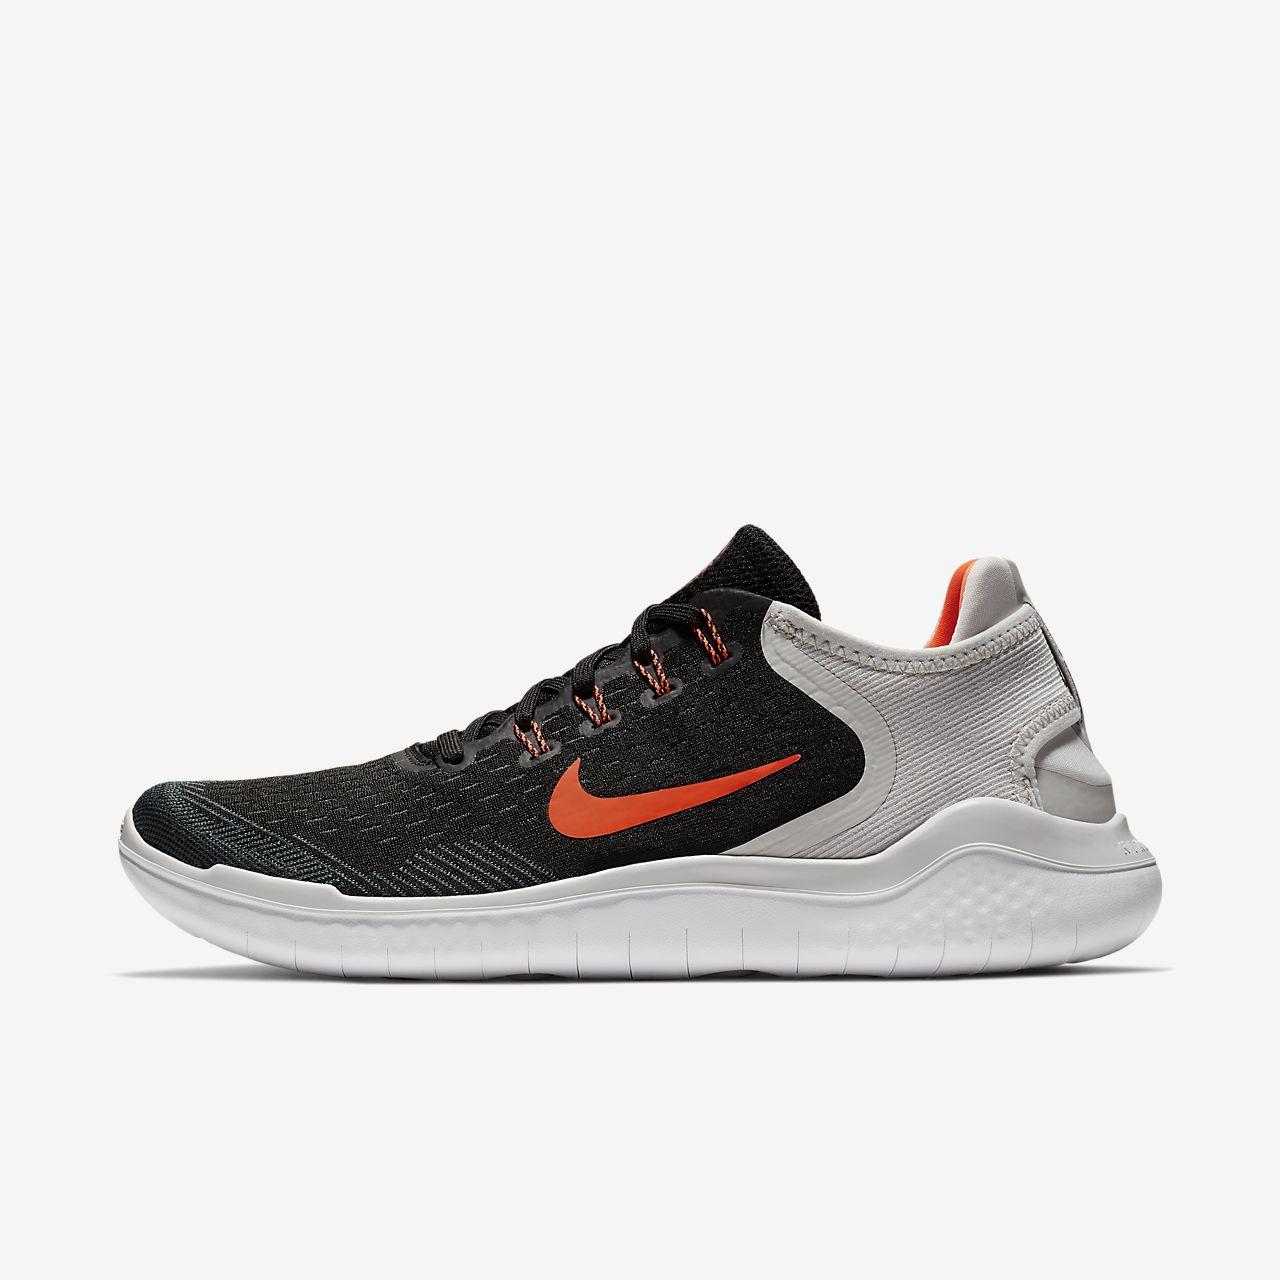 Men's Nike Free 5.0 TR FIT da palestra scarpe da ginnastica Estivo Taglia UK 8